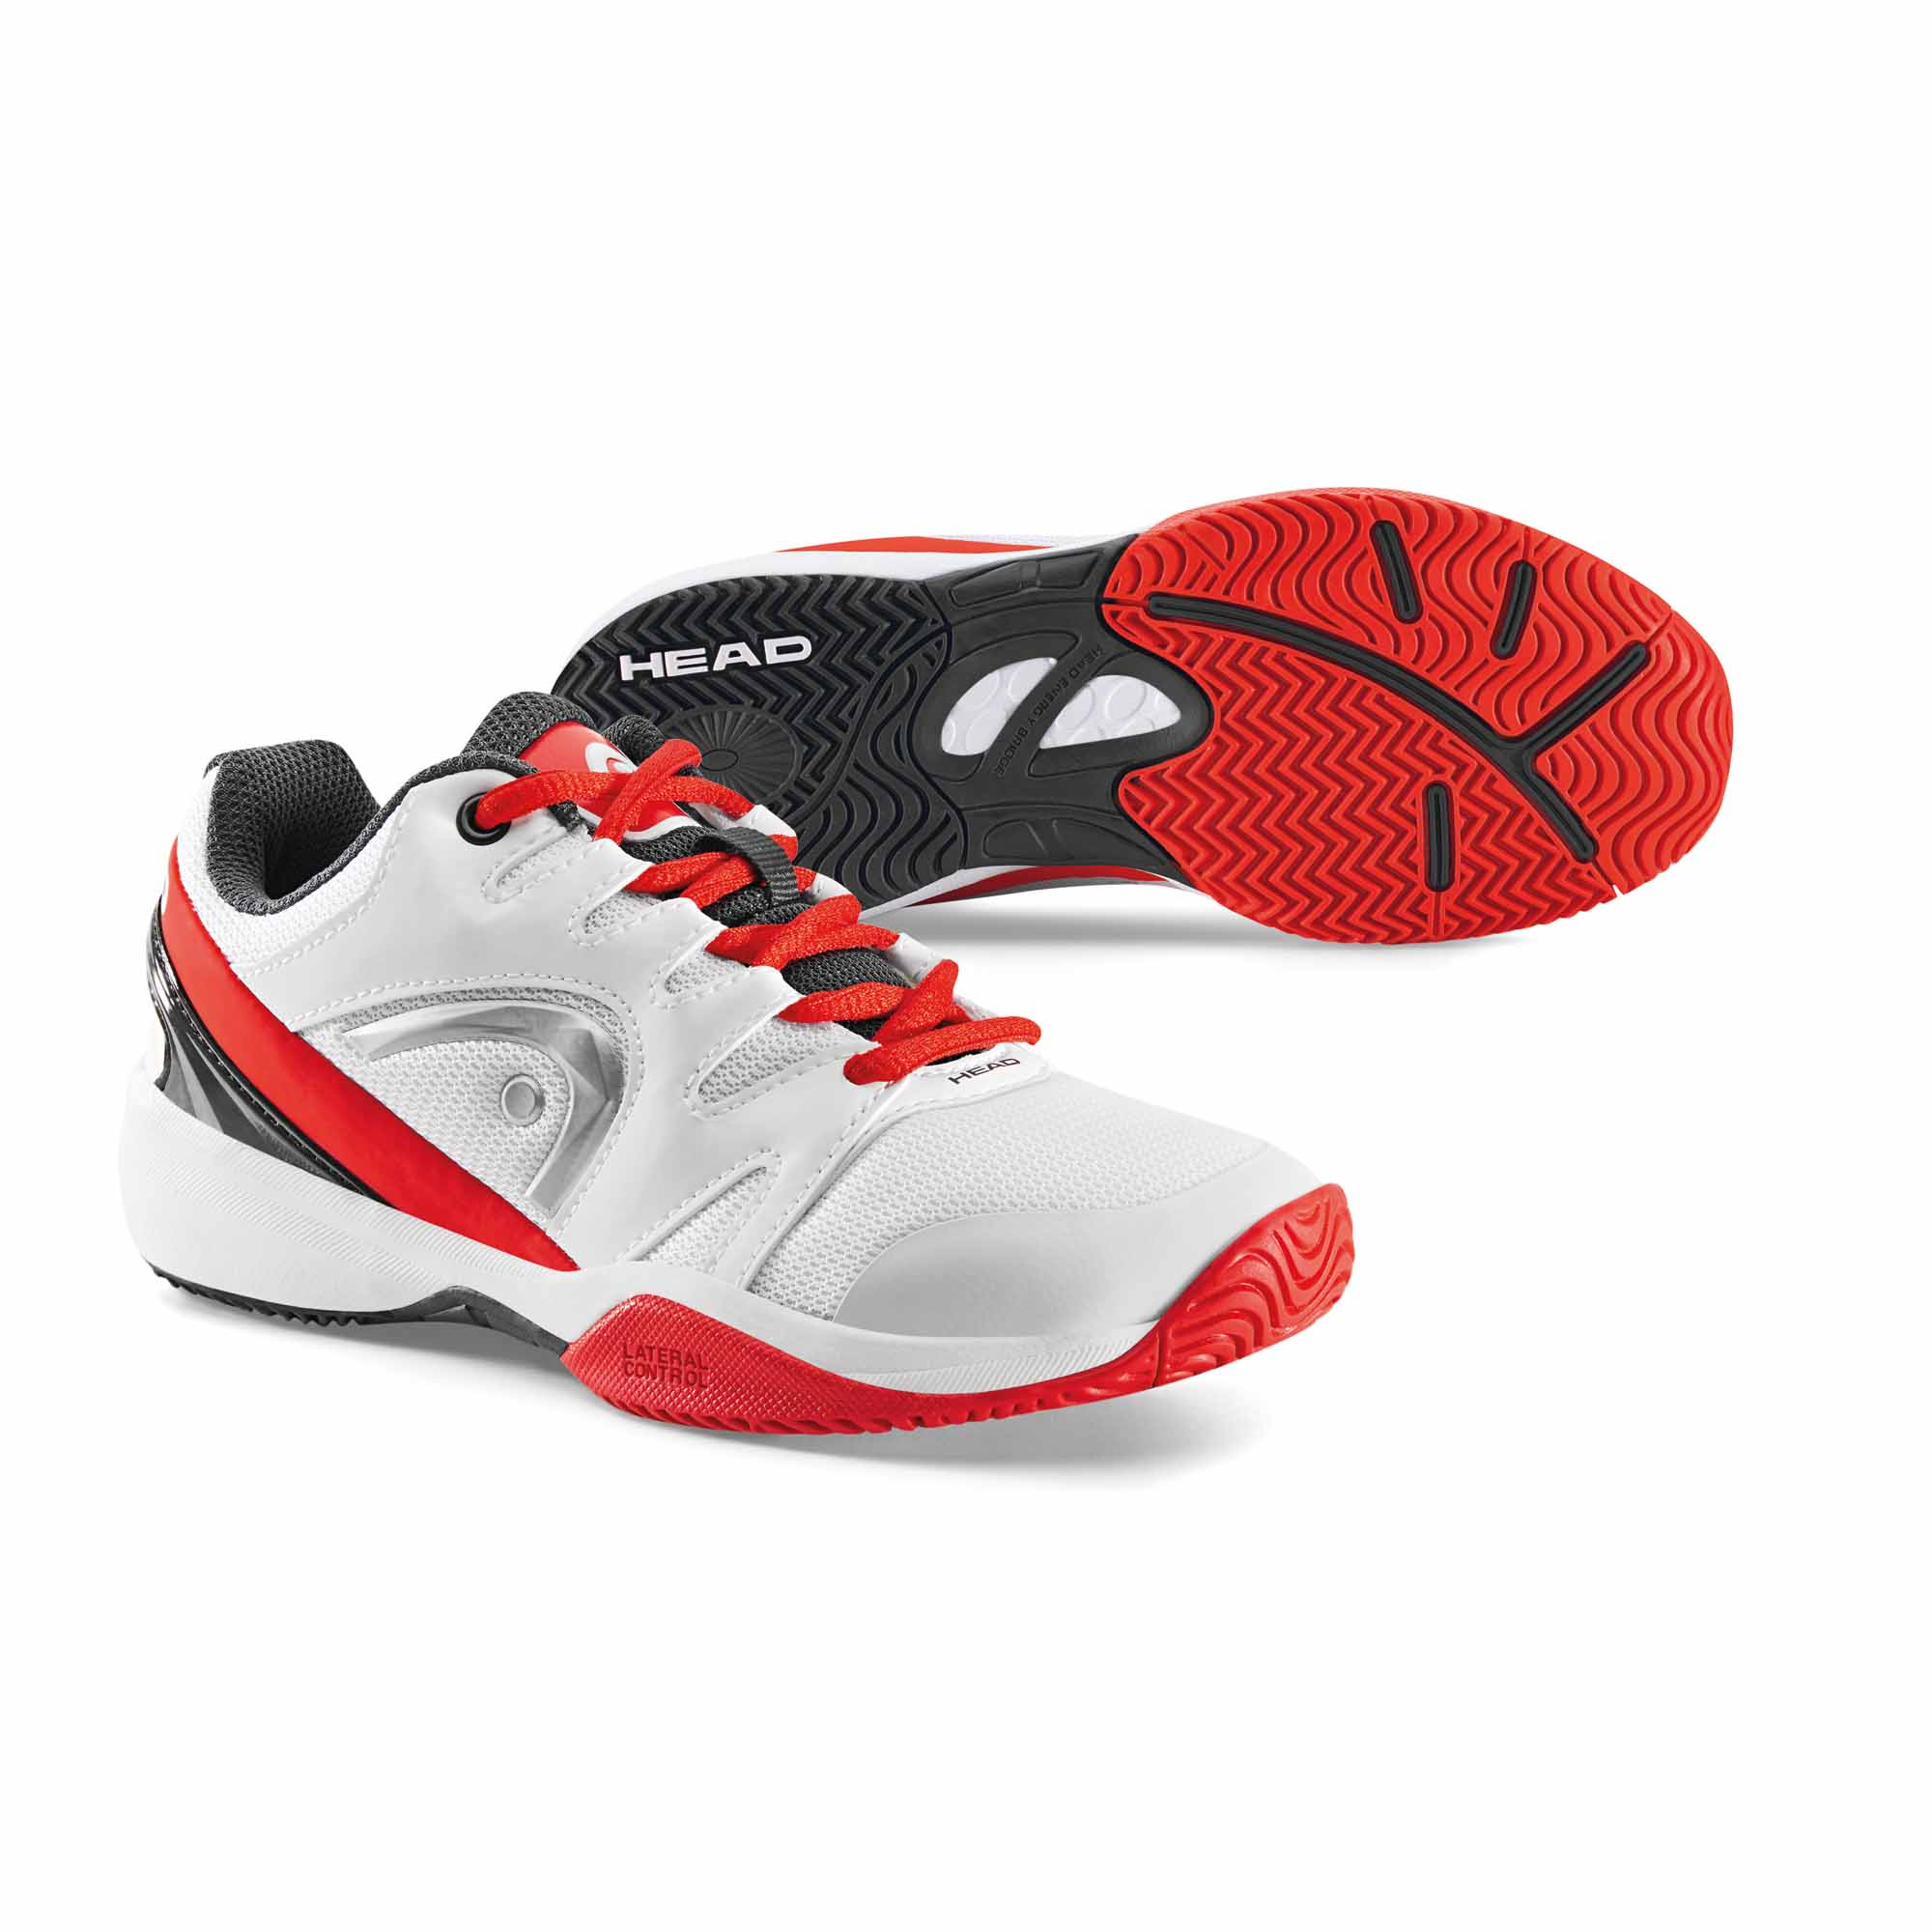 Head Nitro Junior Tennis Shoes  WhiteRed 4 UK